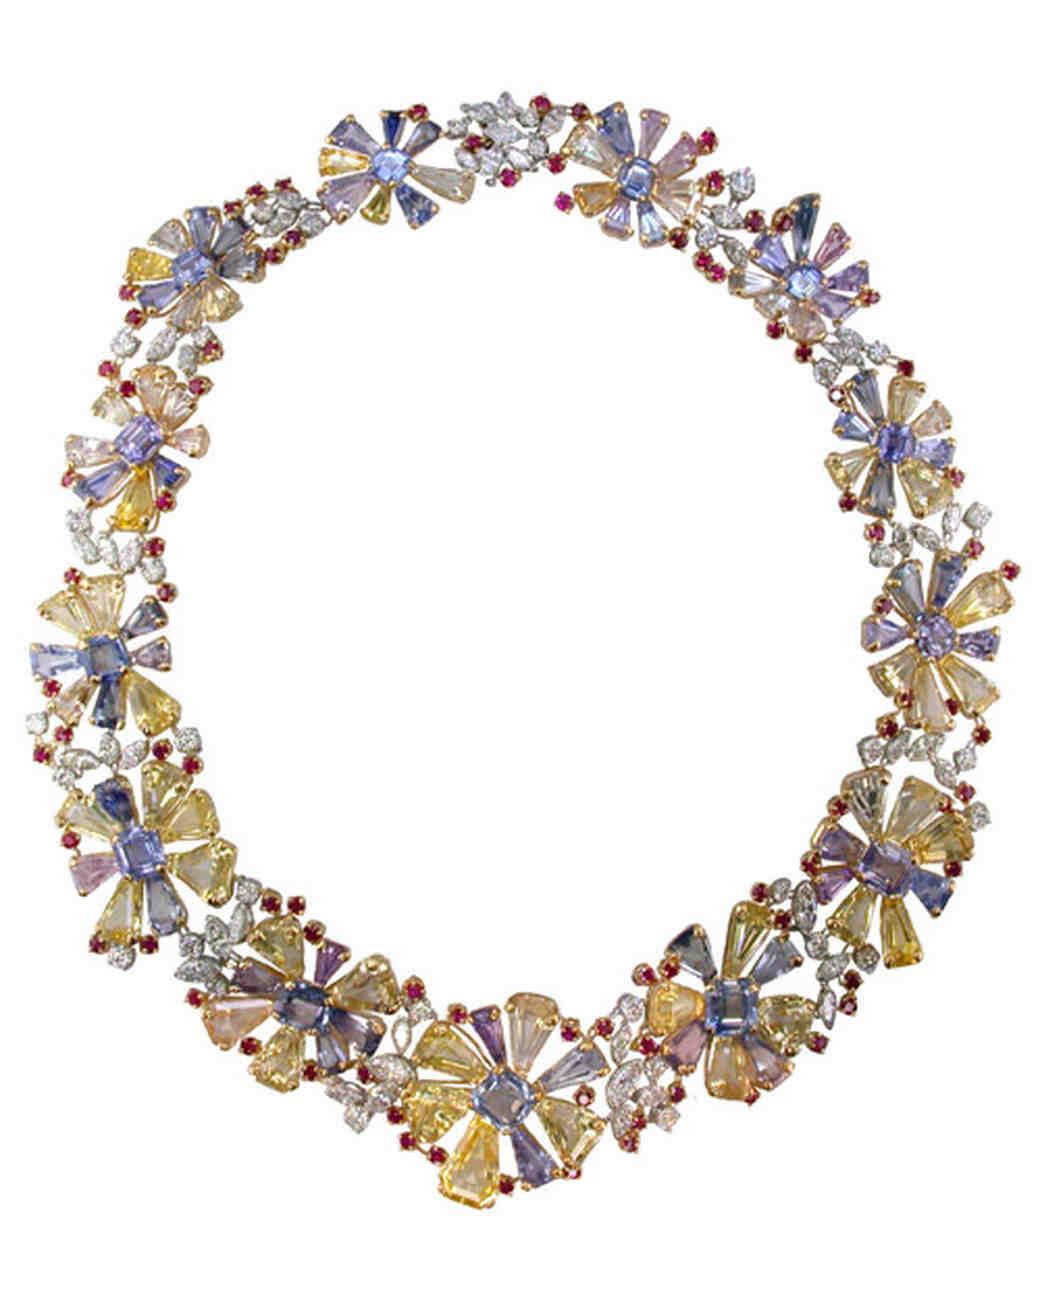 heyman_ohb_601754_gold_plat_multi_col_ruby_dia_necklace.jpg